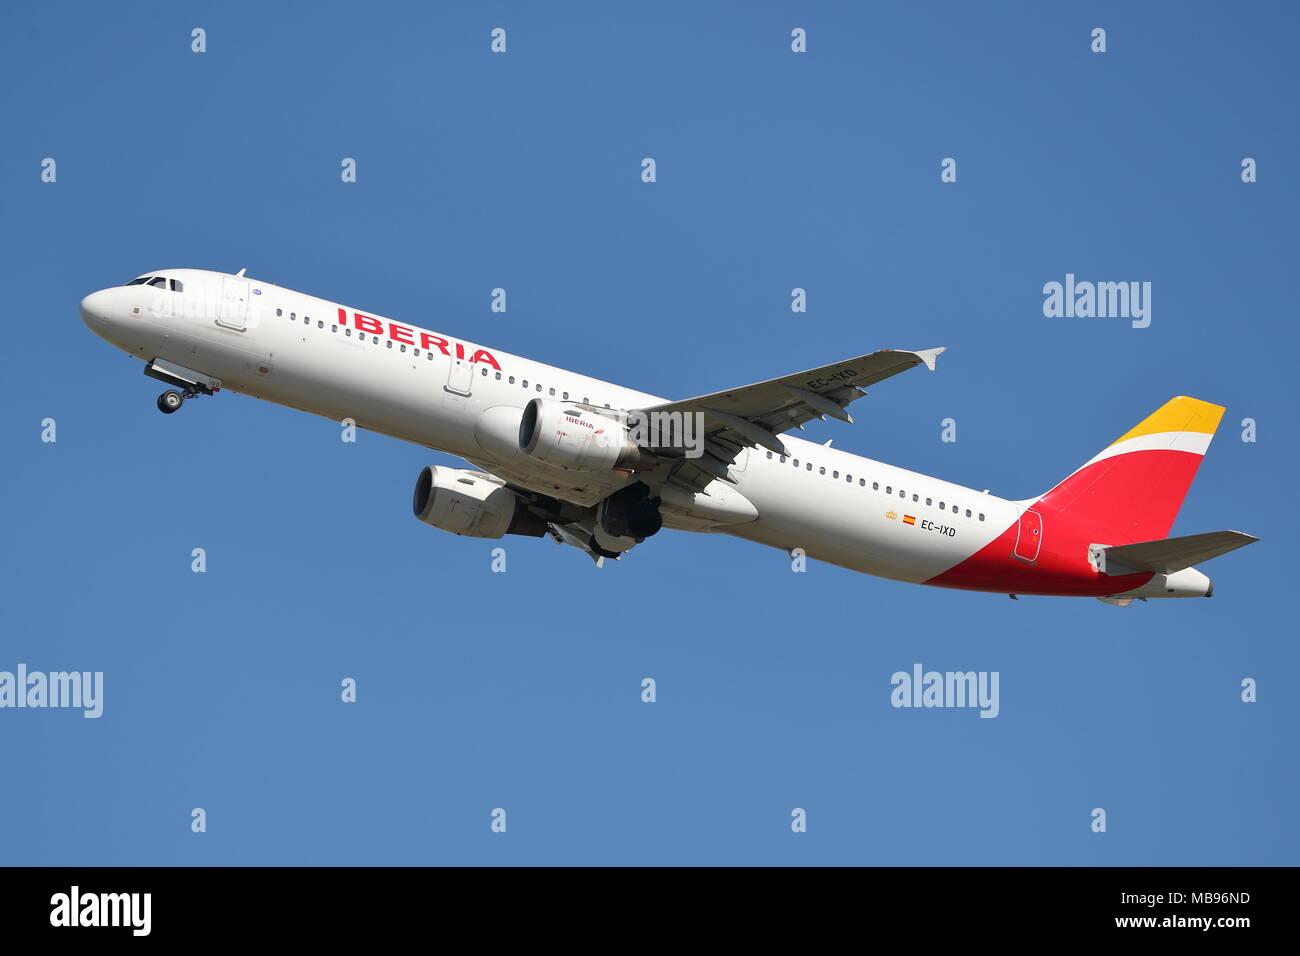 Iberia Airbus A321 EC-IXD departing from London Heathrow Airport, UK - Stock Image